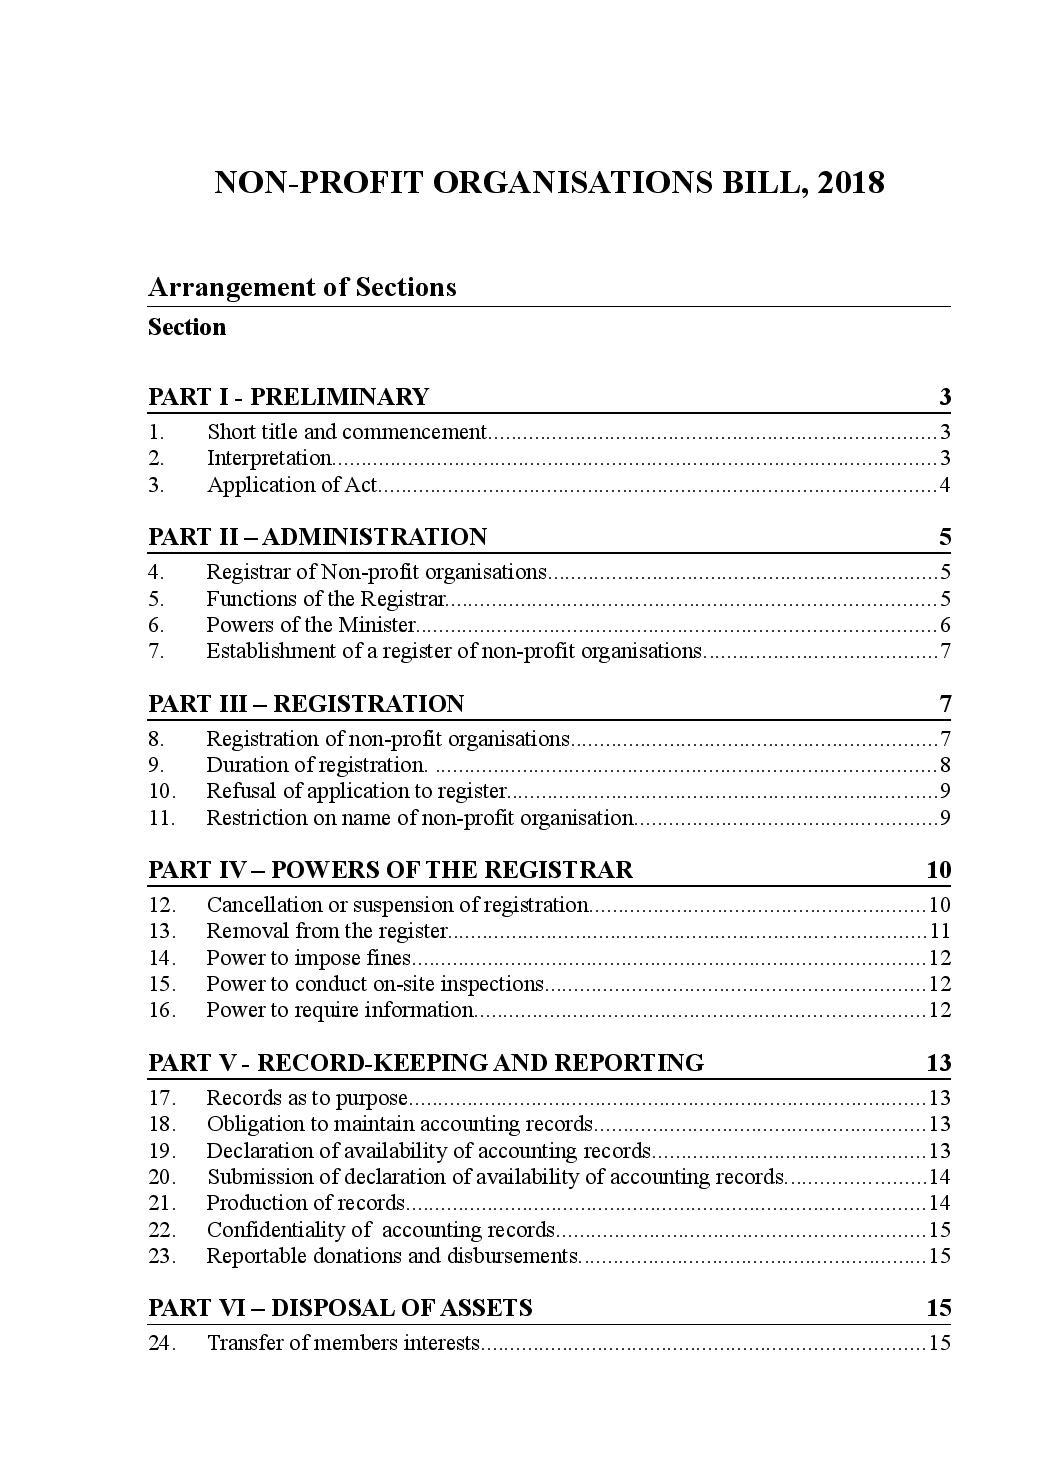 Non-profit+Organisations+Bill_2C+2018(1)